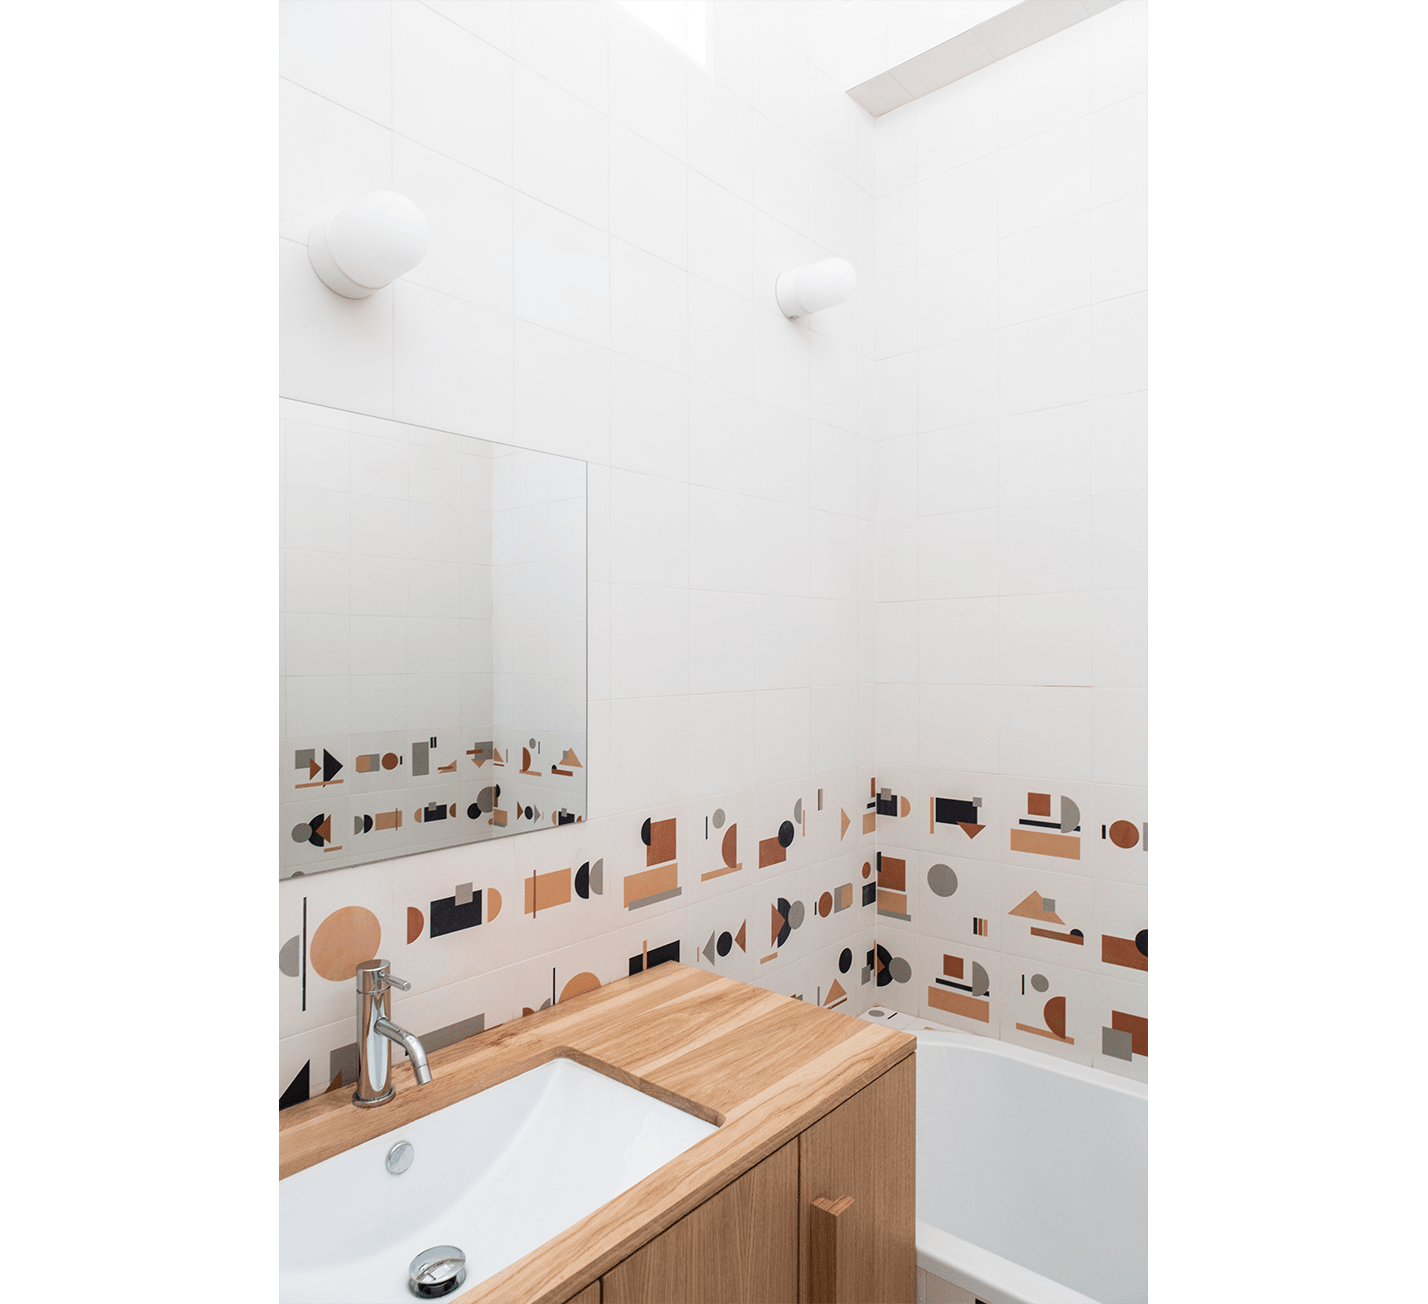 Projet-Emile-Atelier-Steve-Pauline-Borgia-Architecte-interieur-15-min